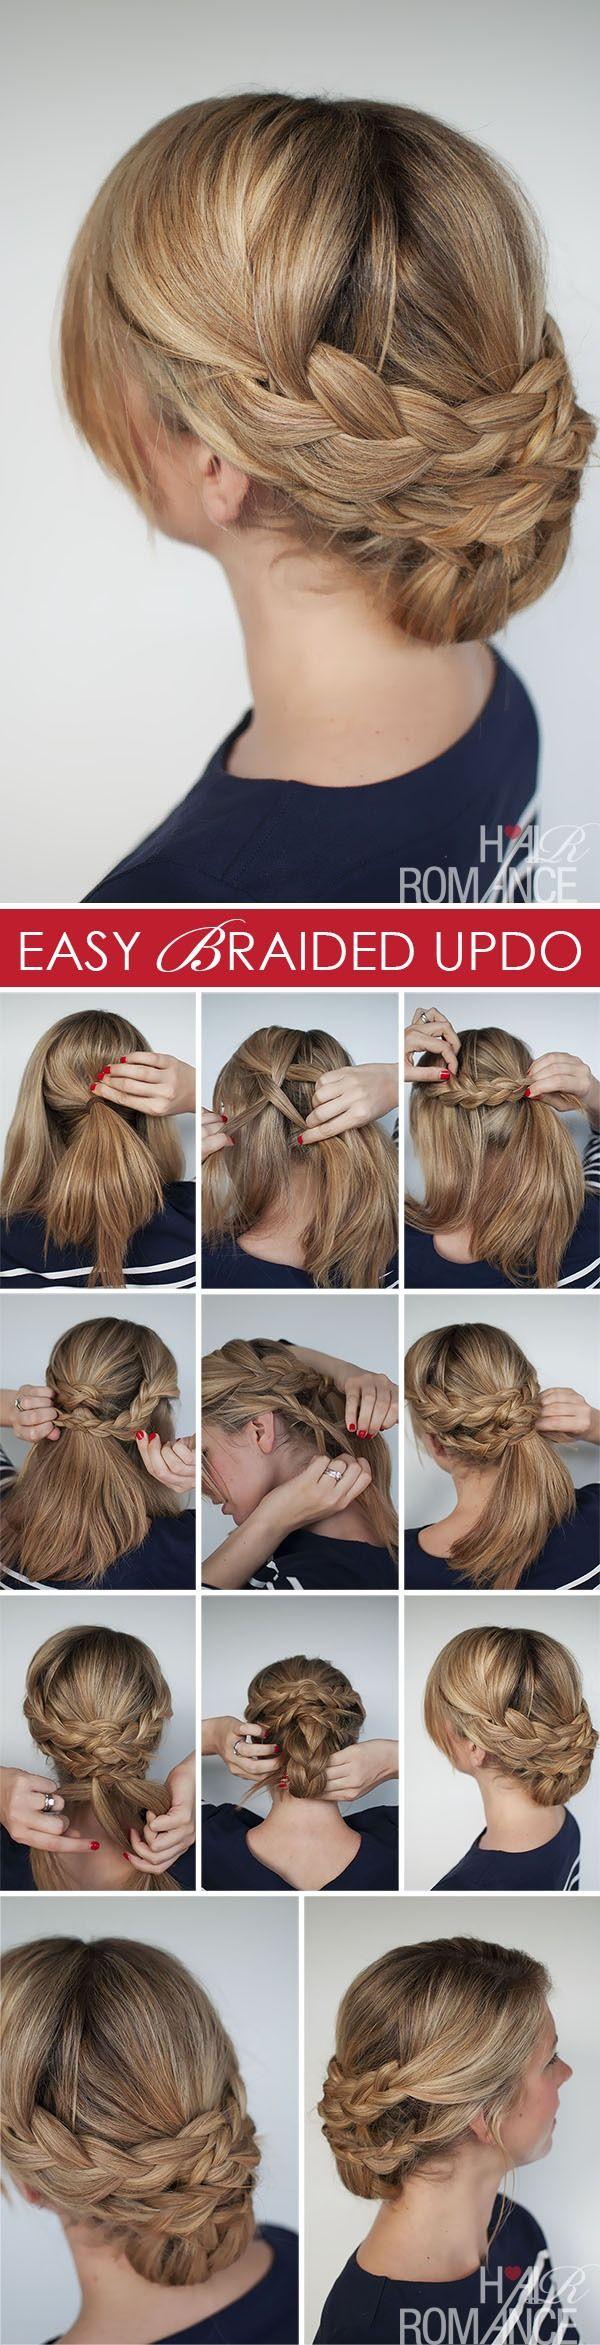 Easy Braided Updo Tutorial #Beauty #Trusper #Tip